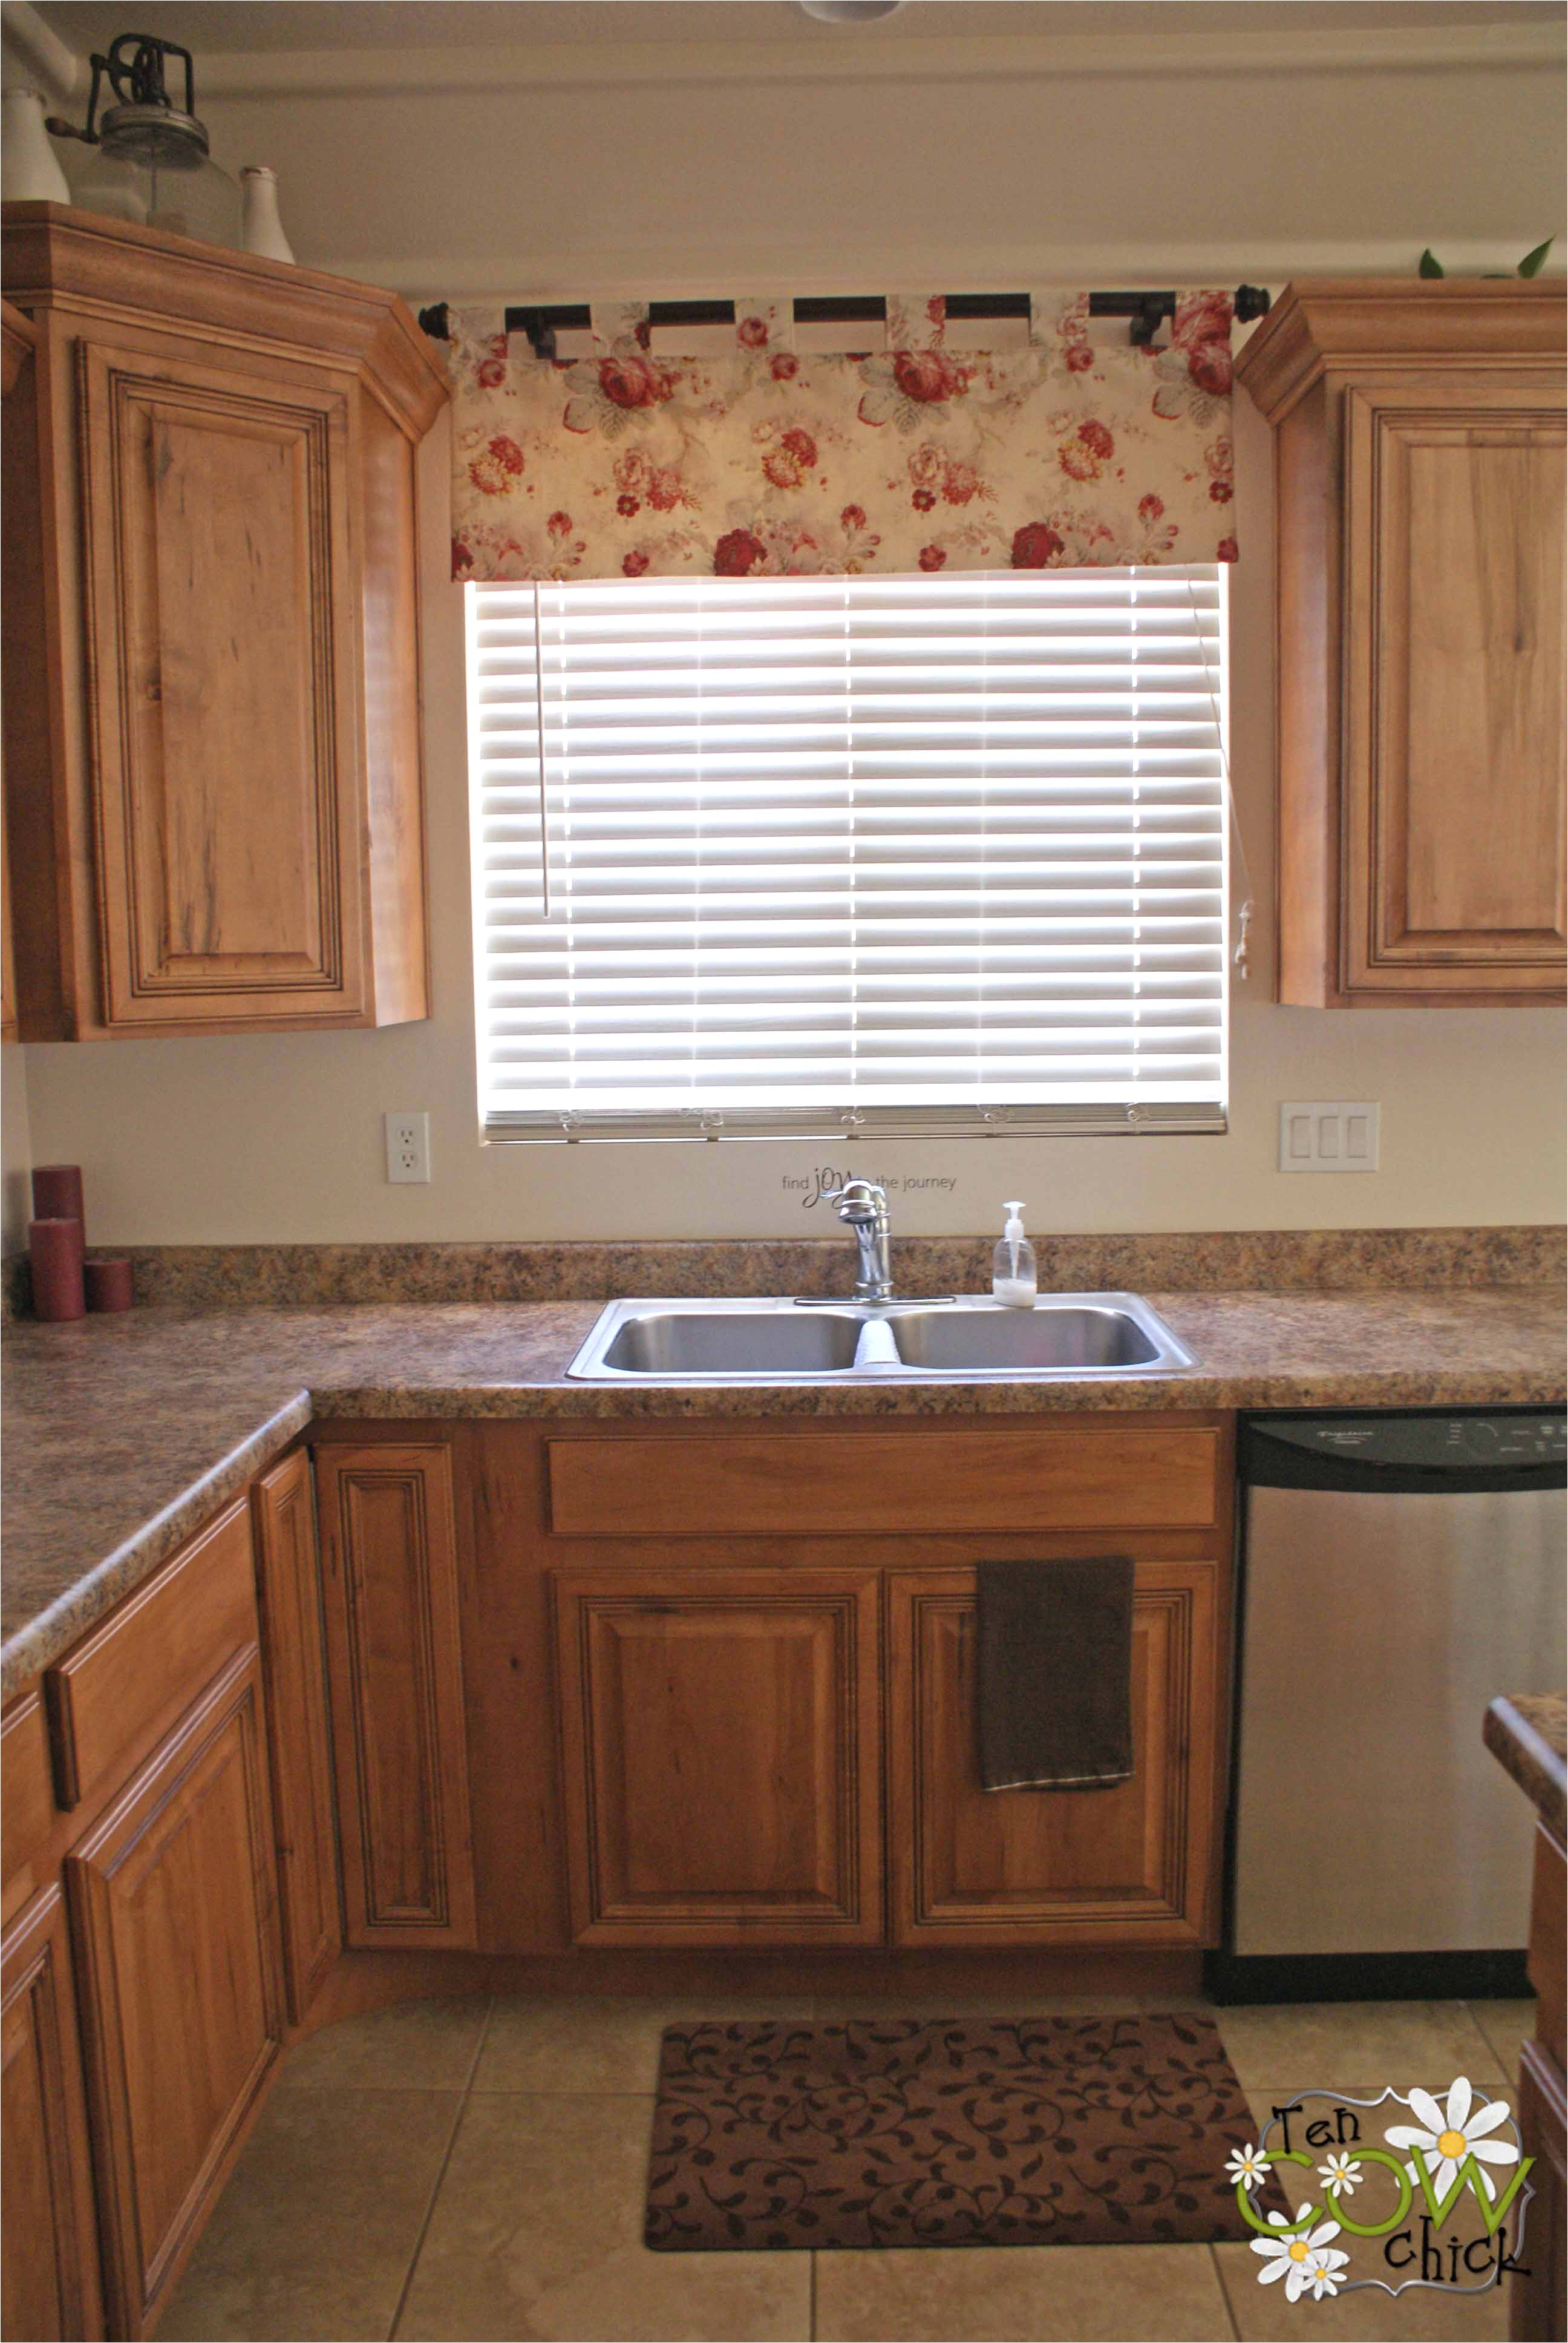 Catchy Kitchen Sink Window Treatment Ideas Sink Kitchen Sink Window New Sink Deep Kitchen Sinks Cast Ironi 0d